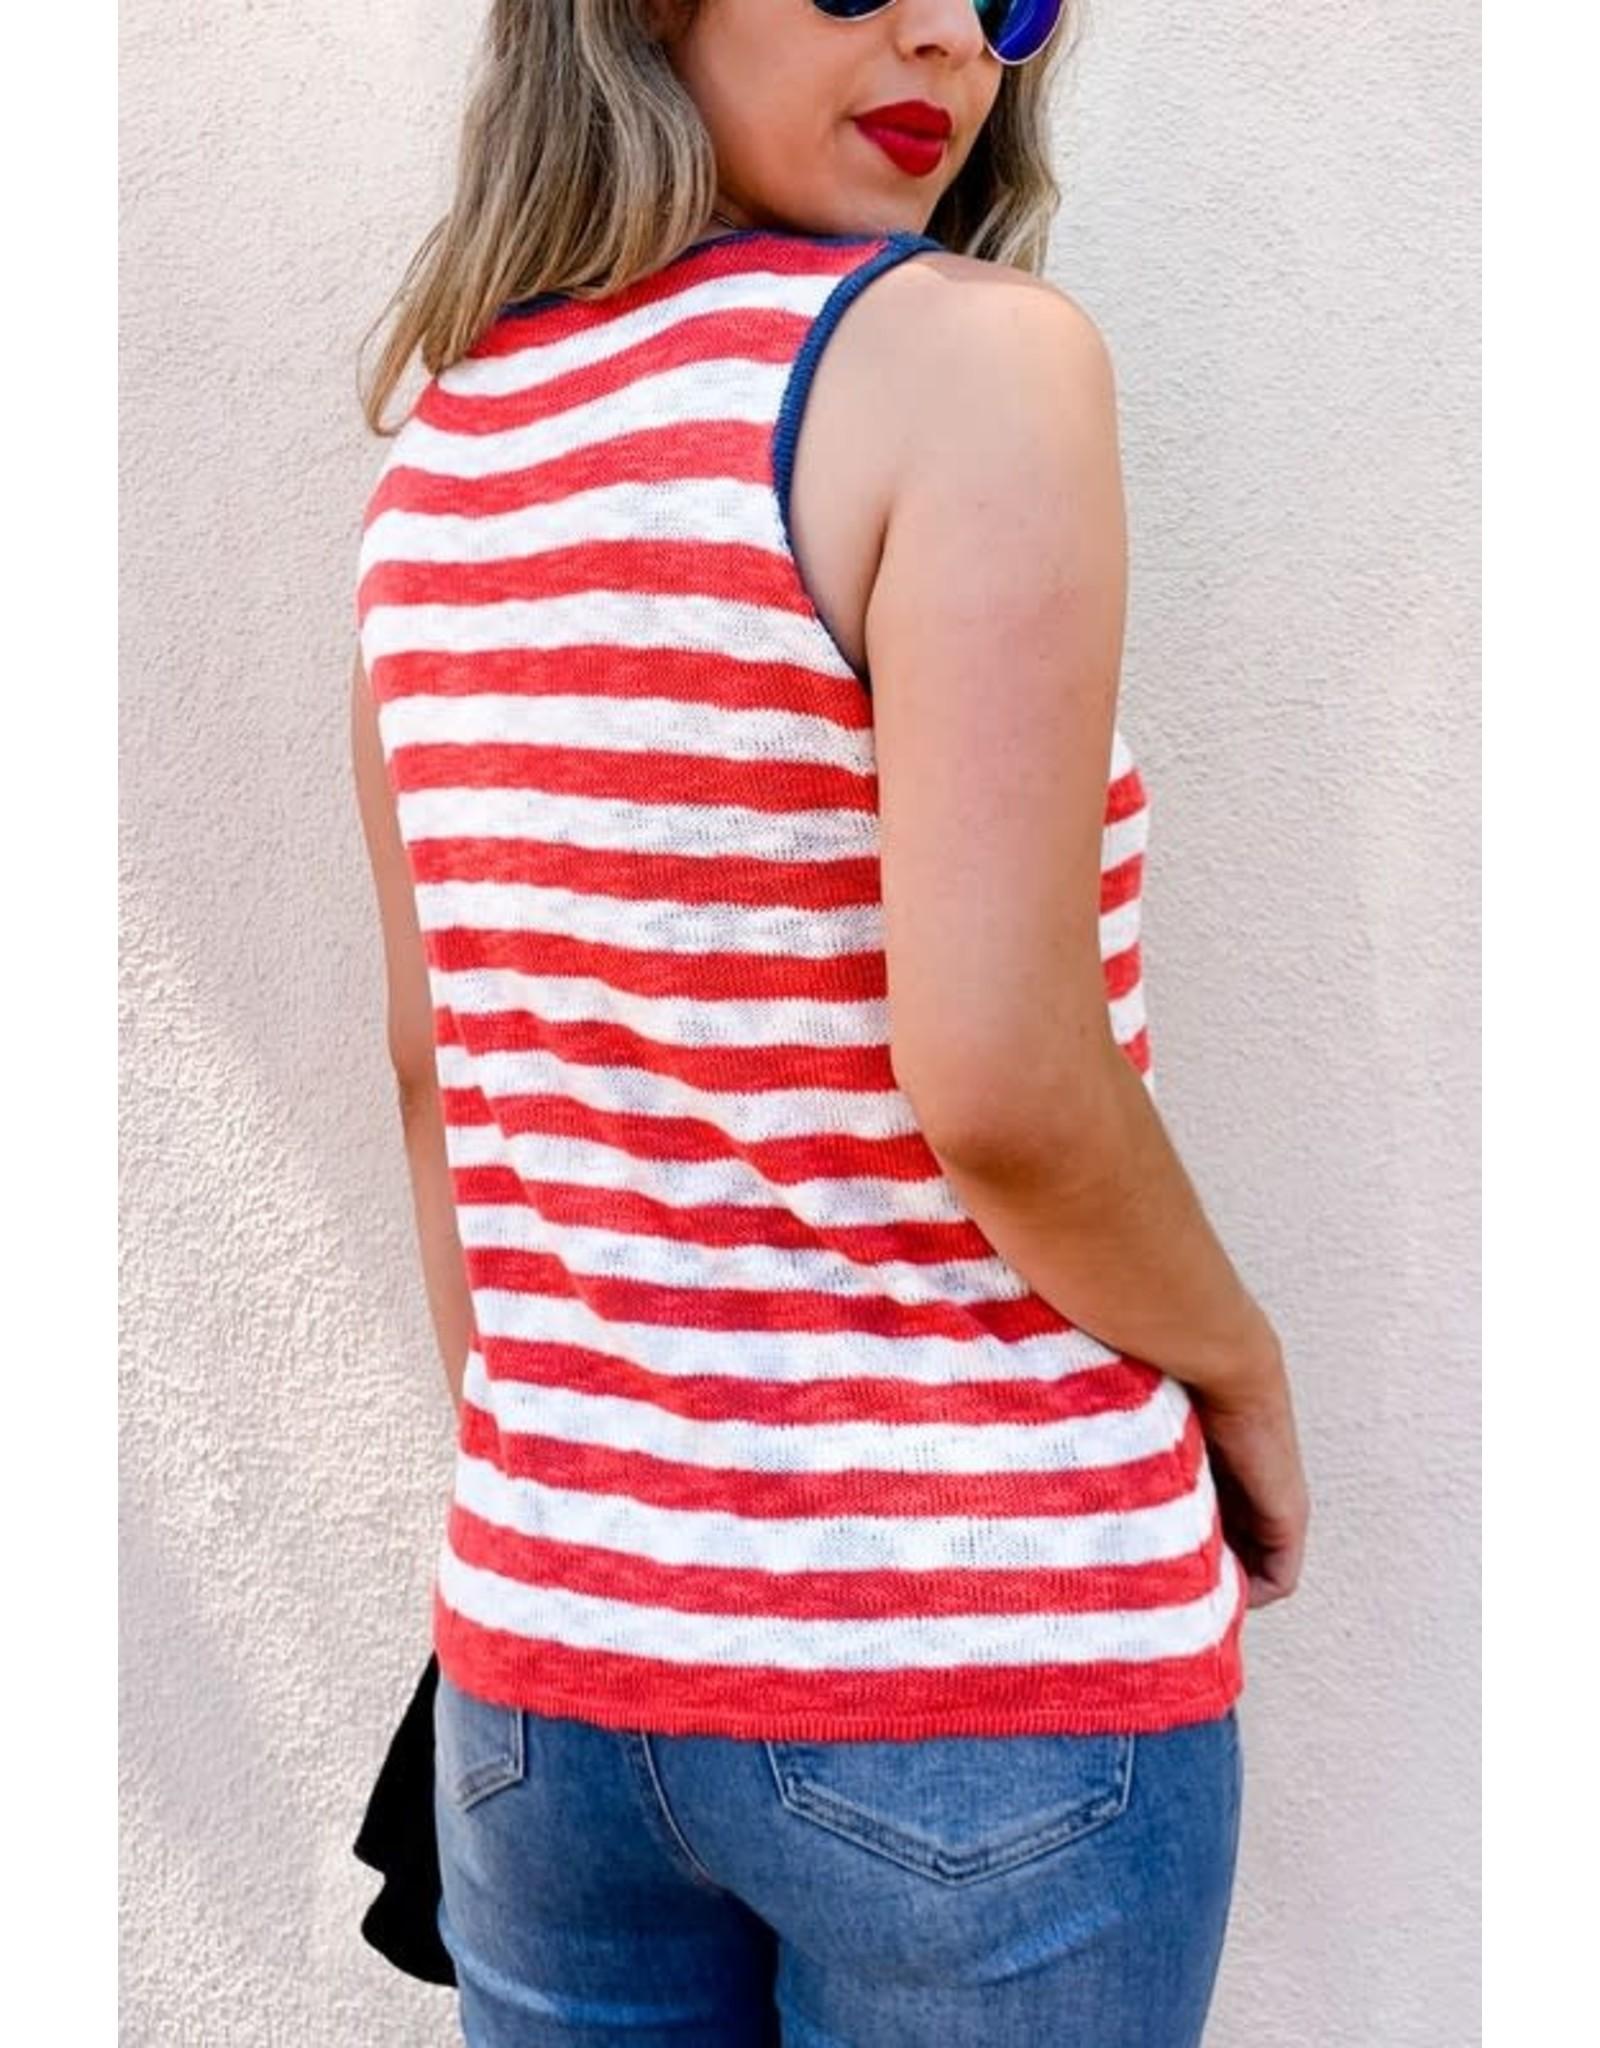 Sleeveless Knit American Flag Tank Top